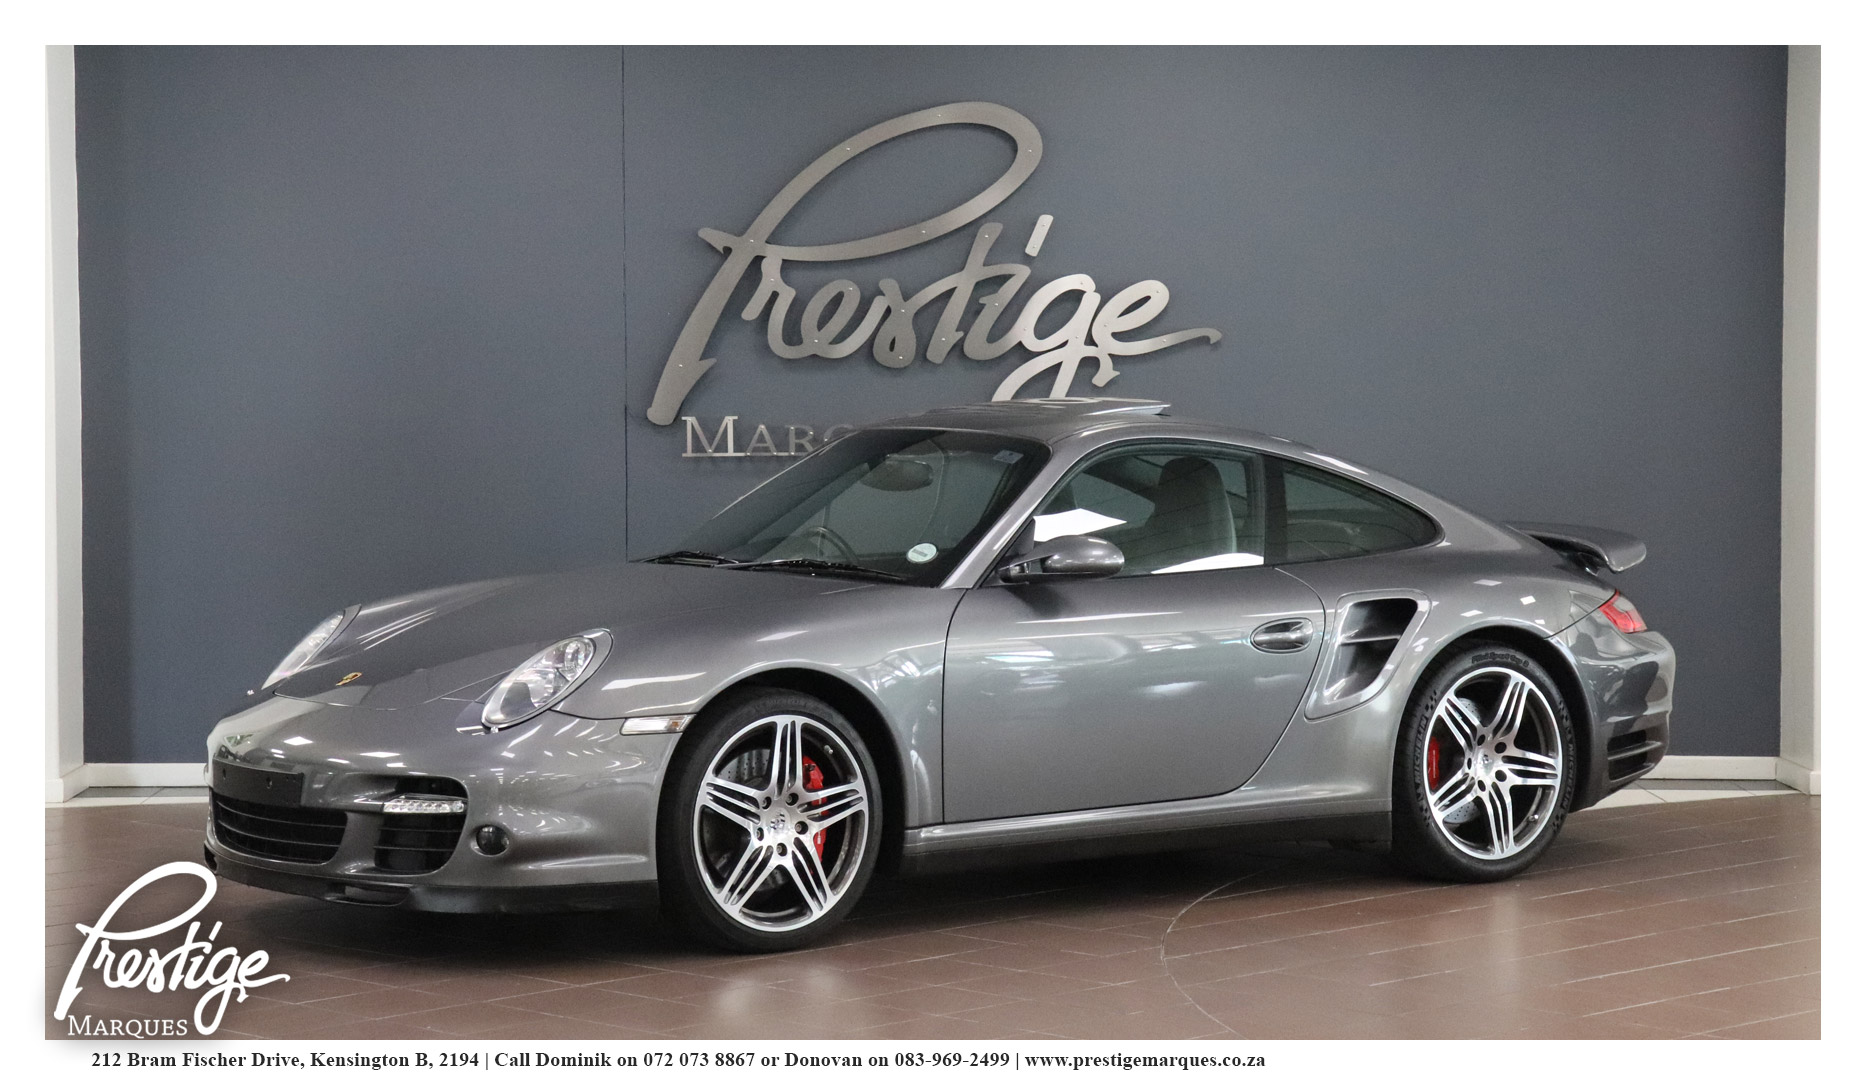 2008-Porsche-911-997-Turbo-Tiptronic-Prestige-Marques-Randburg-Sandton-7